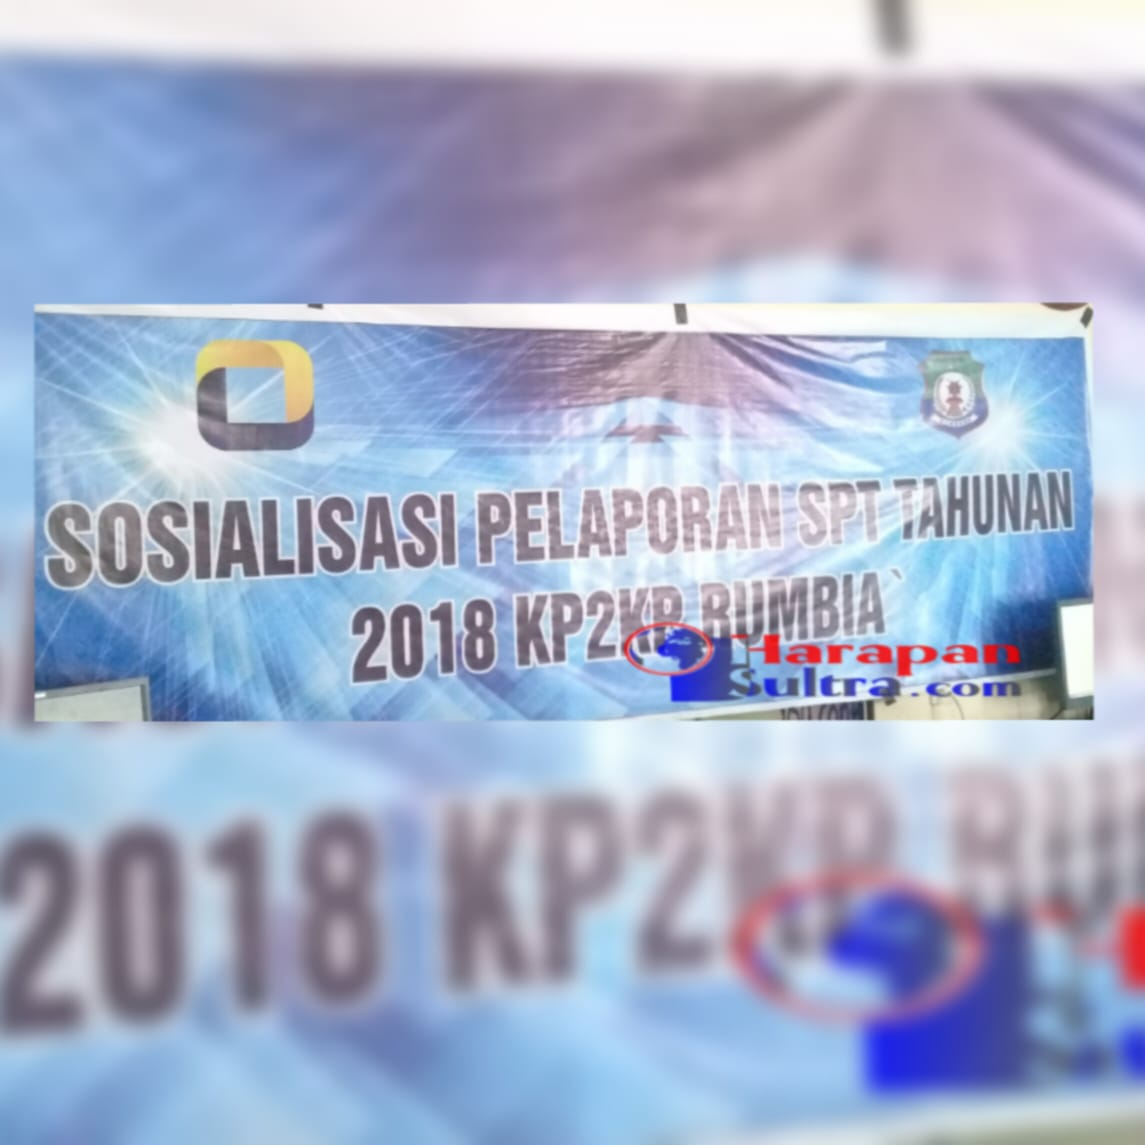 Sosialisasi Pelaporan SPT Tahunan Pajak KP2KP Rumbia